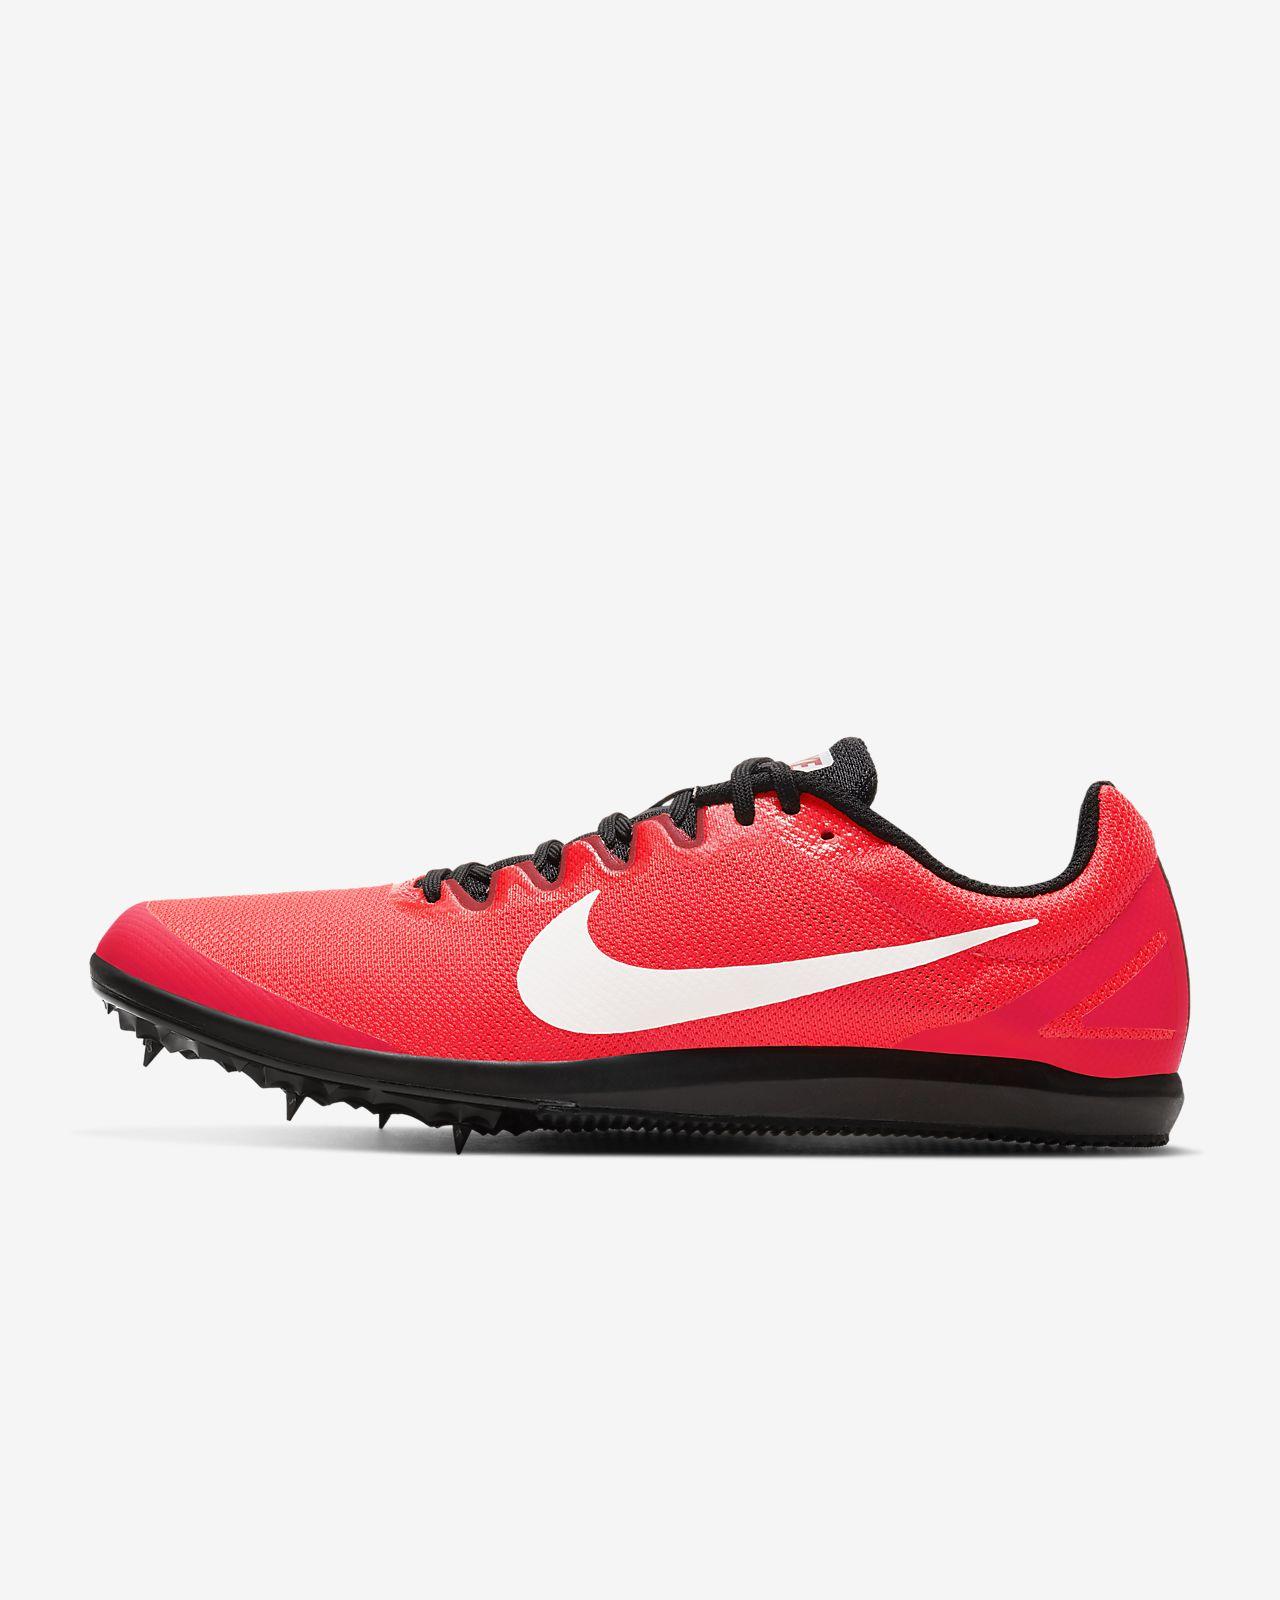 Scarpa chiodata per atletica Nike Zoom Rival D 10 - Unisex